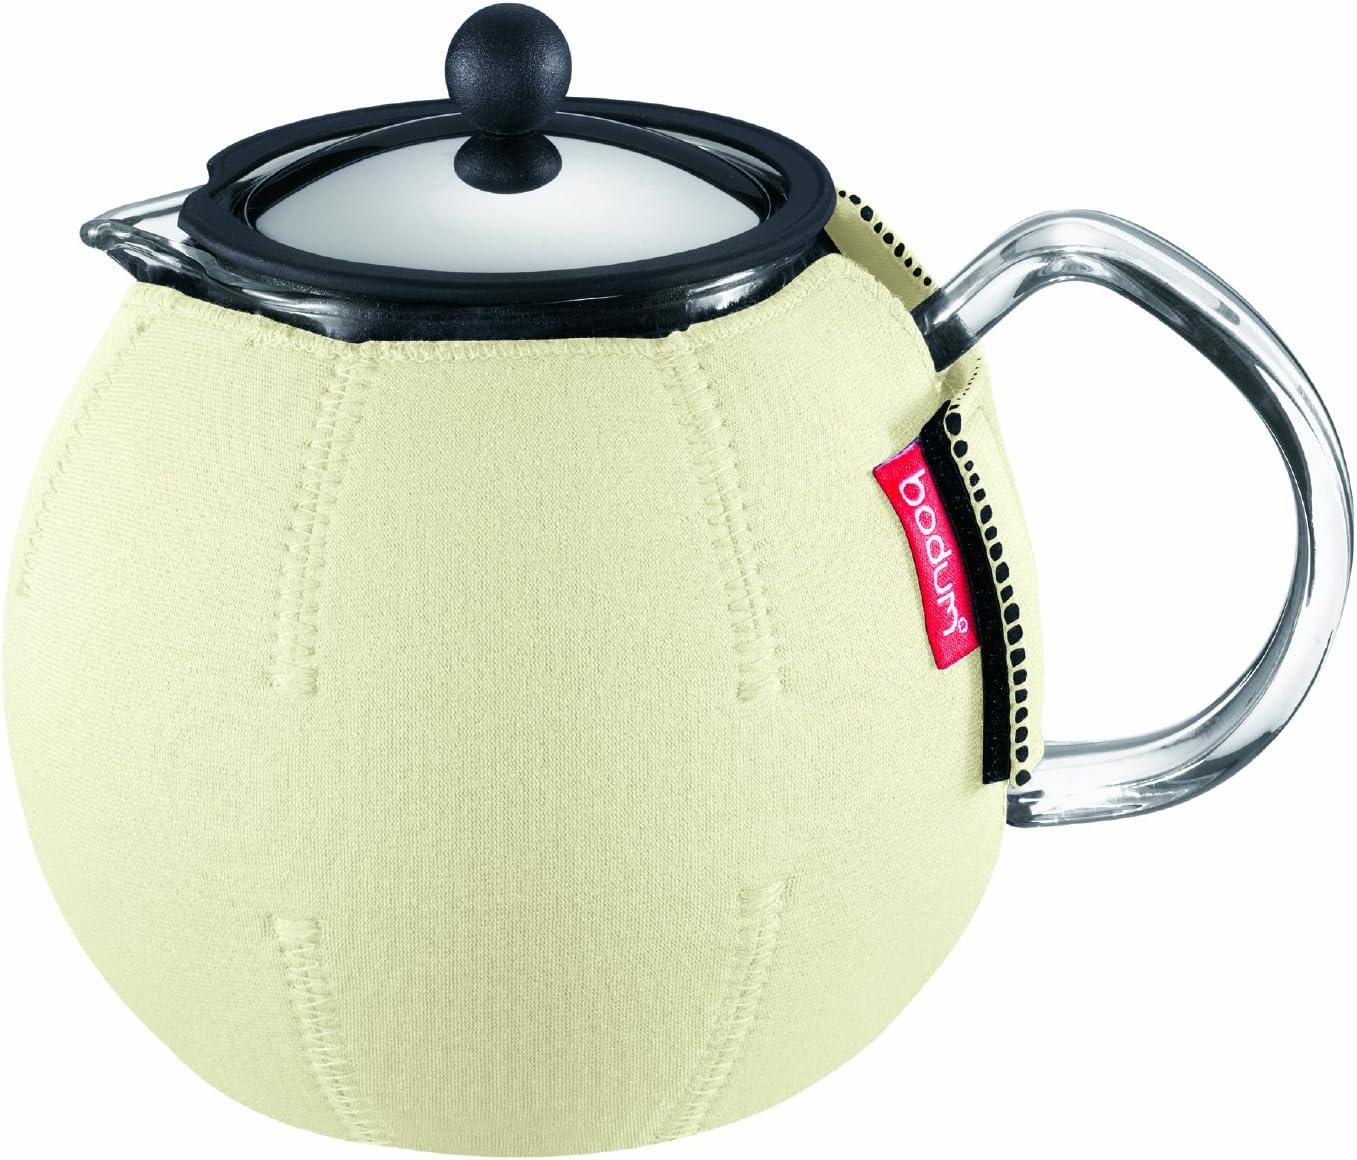 Bodum Nero Thermal Neoprene Tea Press Coat, Off White, 8-Cup